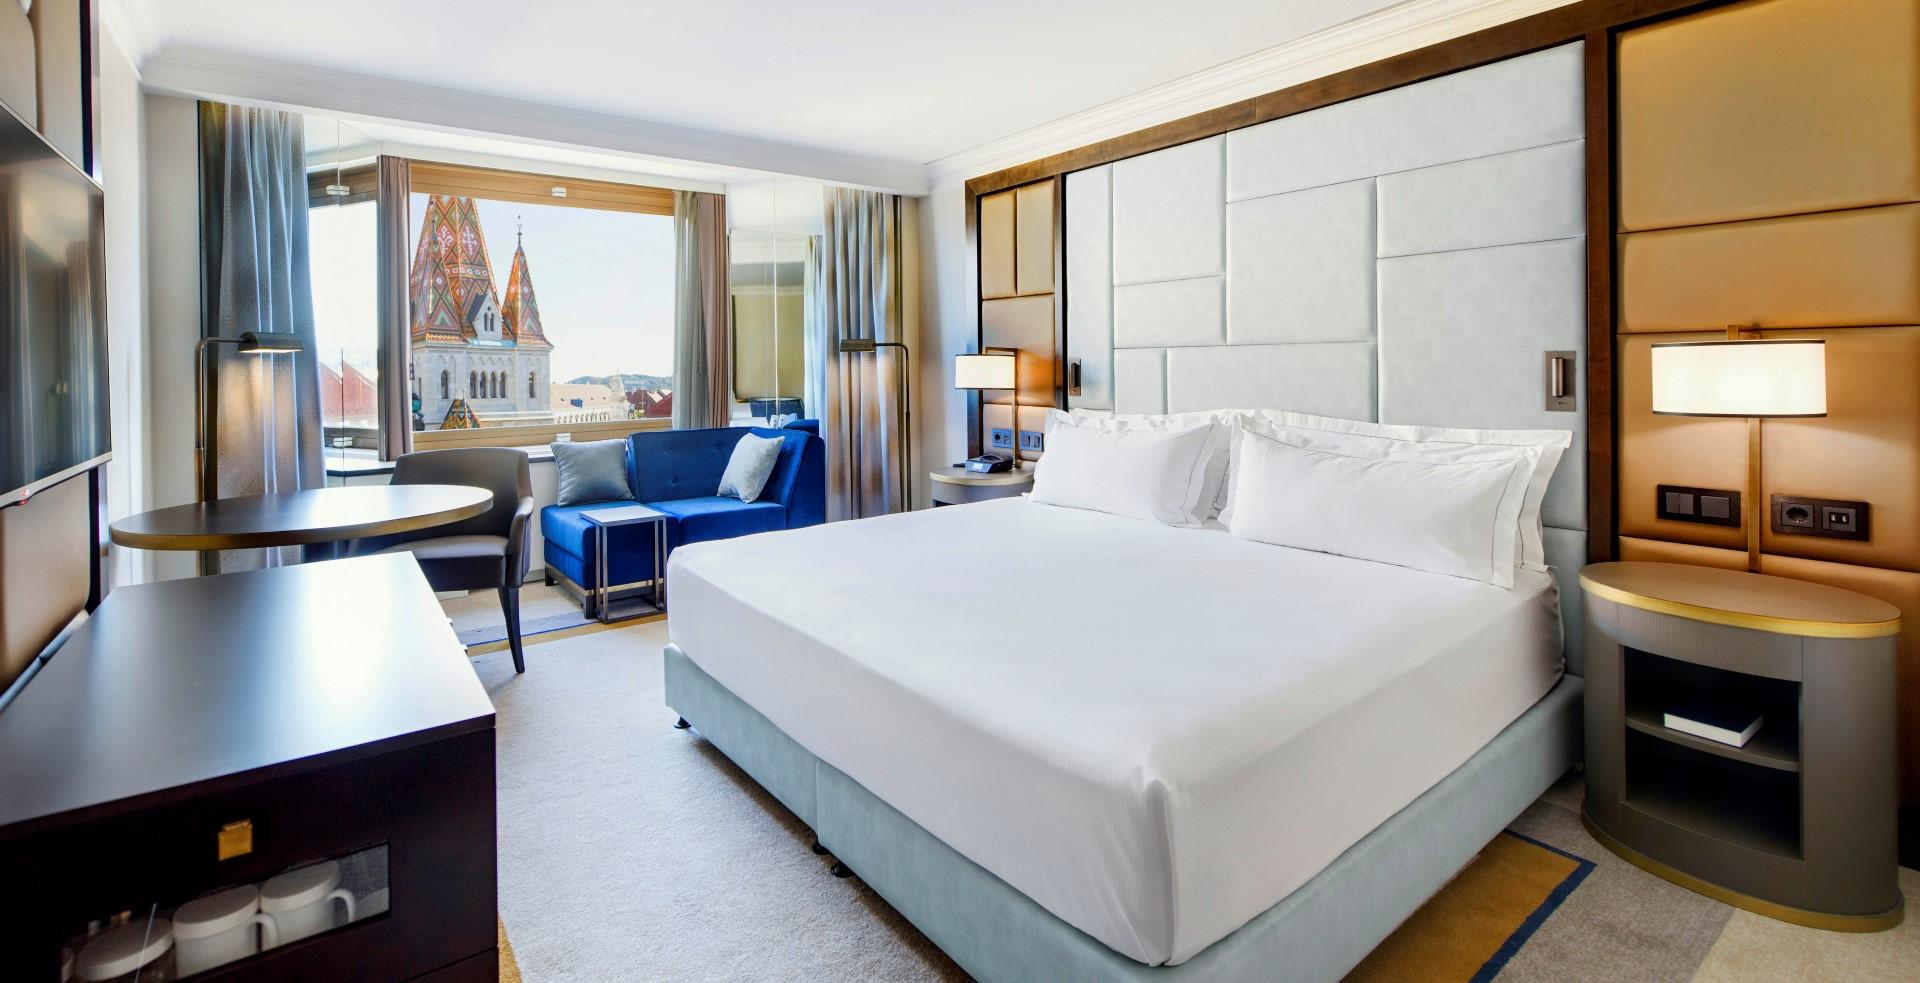 Room - King Hilton Guest Room